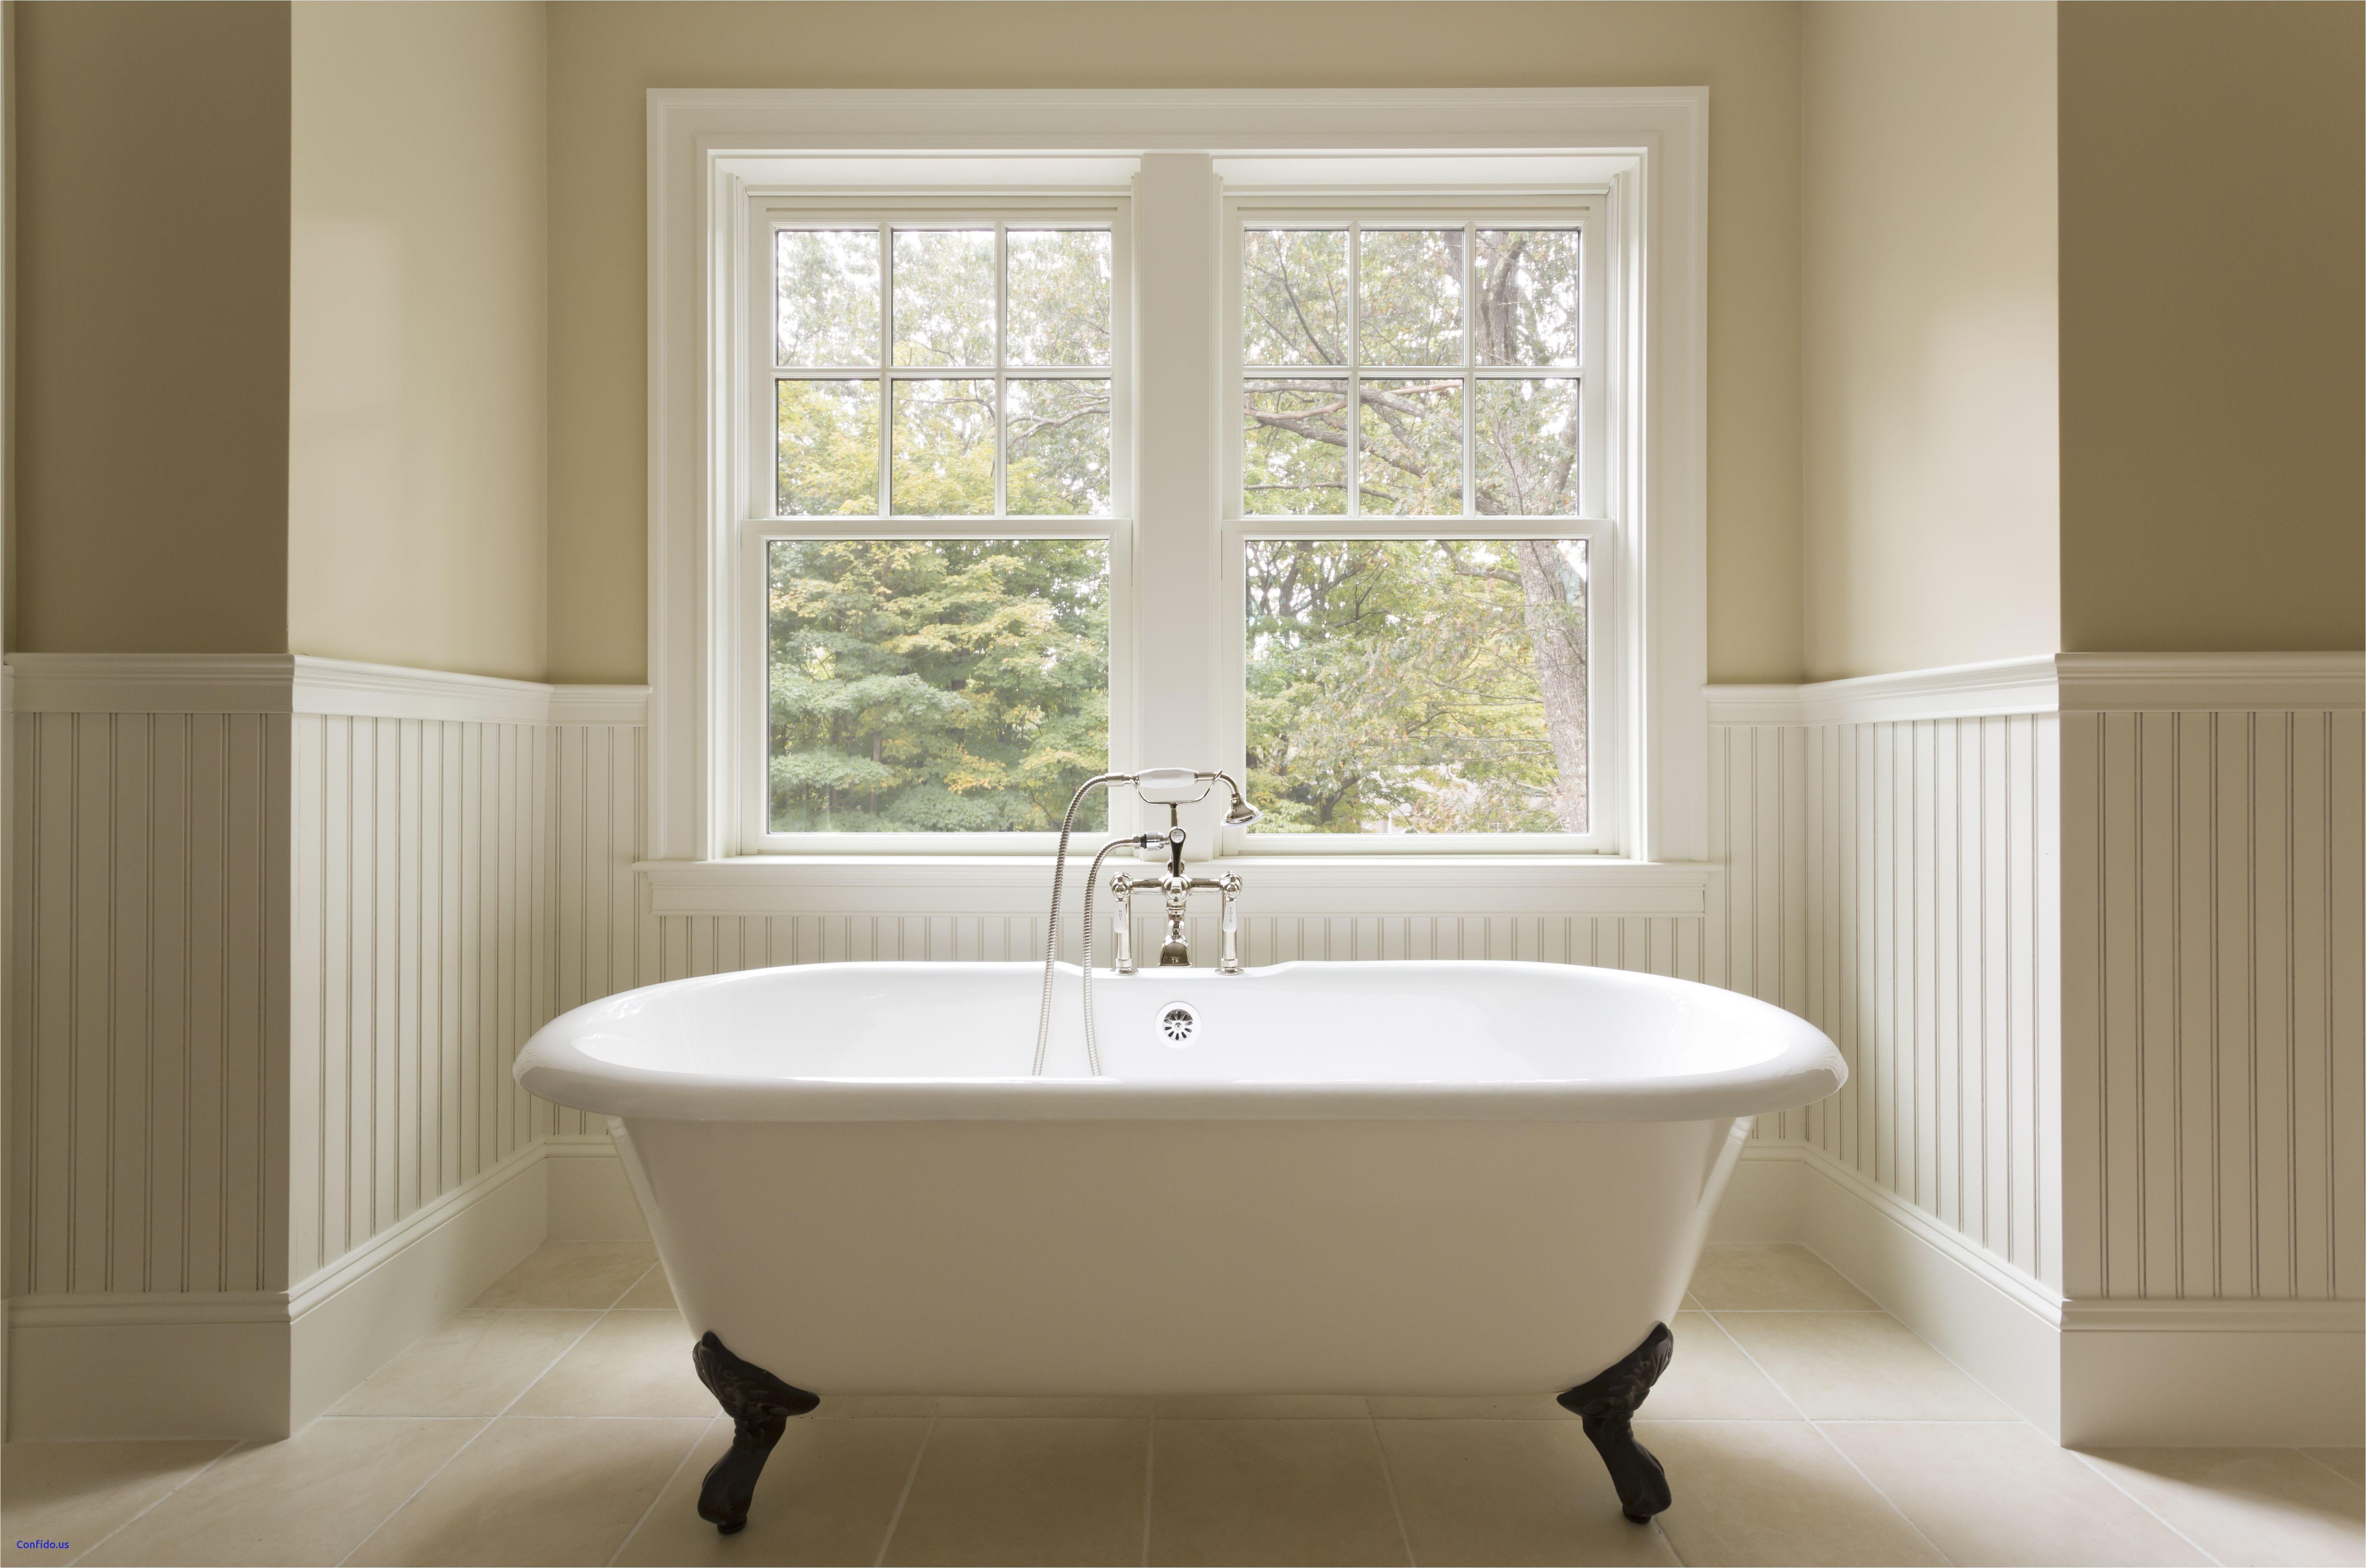 0d best a· 54 27 bathtub inspirational how to unclog a bathtub drain with a